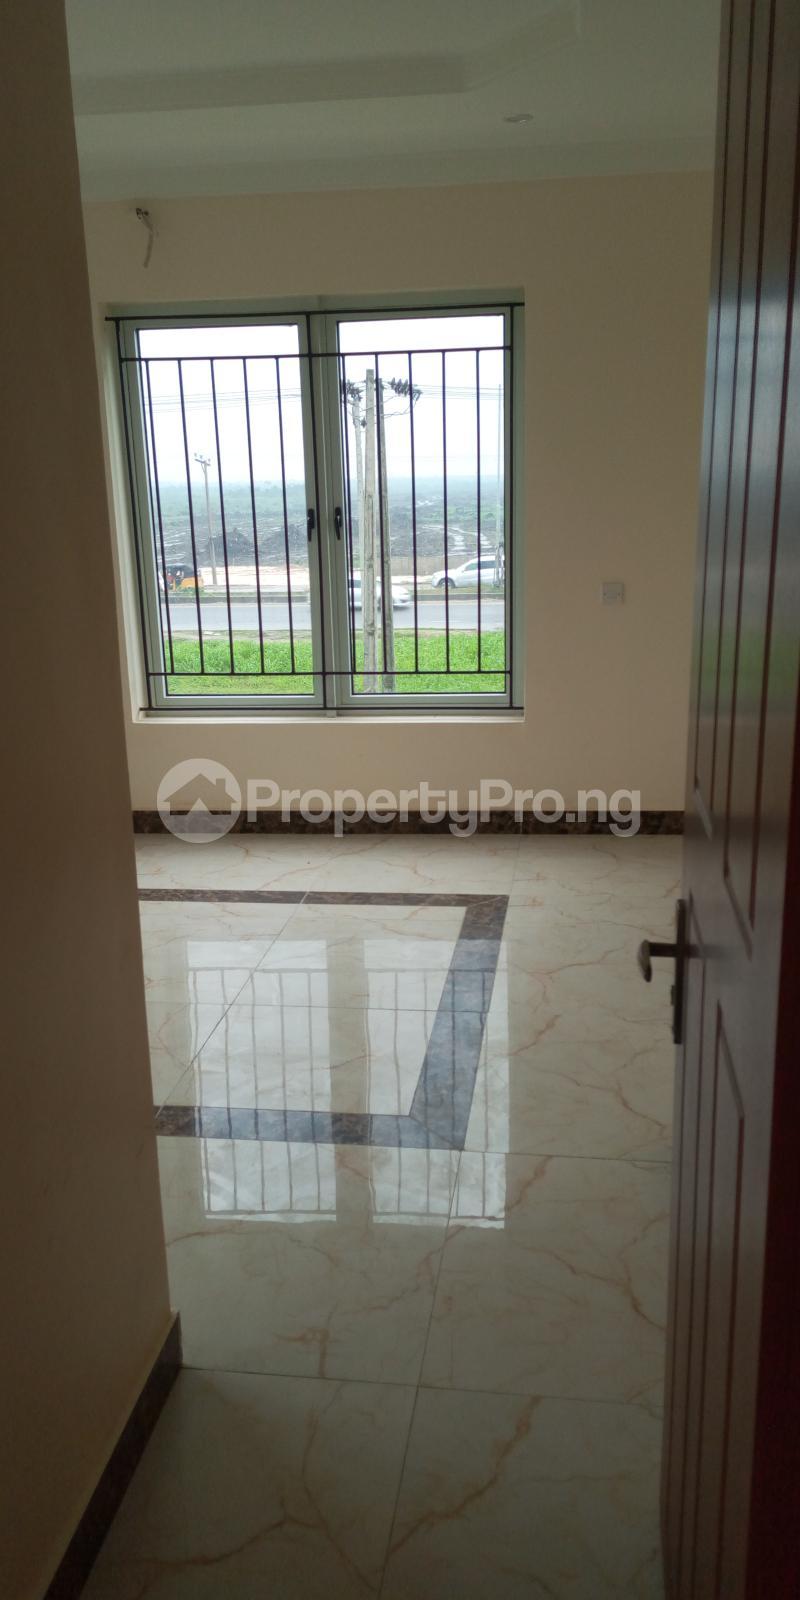 5 bedroom Detached Duplex House for rent Peace Gardens Estate Monastery road Sangotedo Lagos - 5